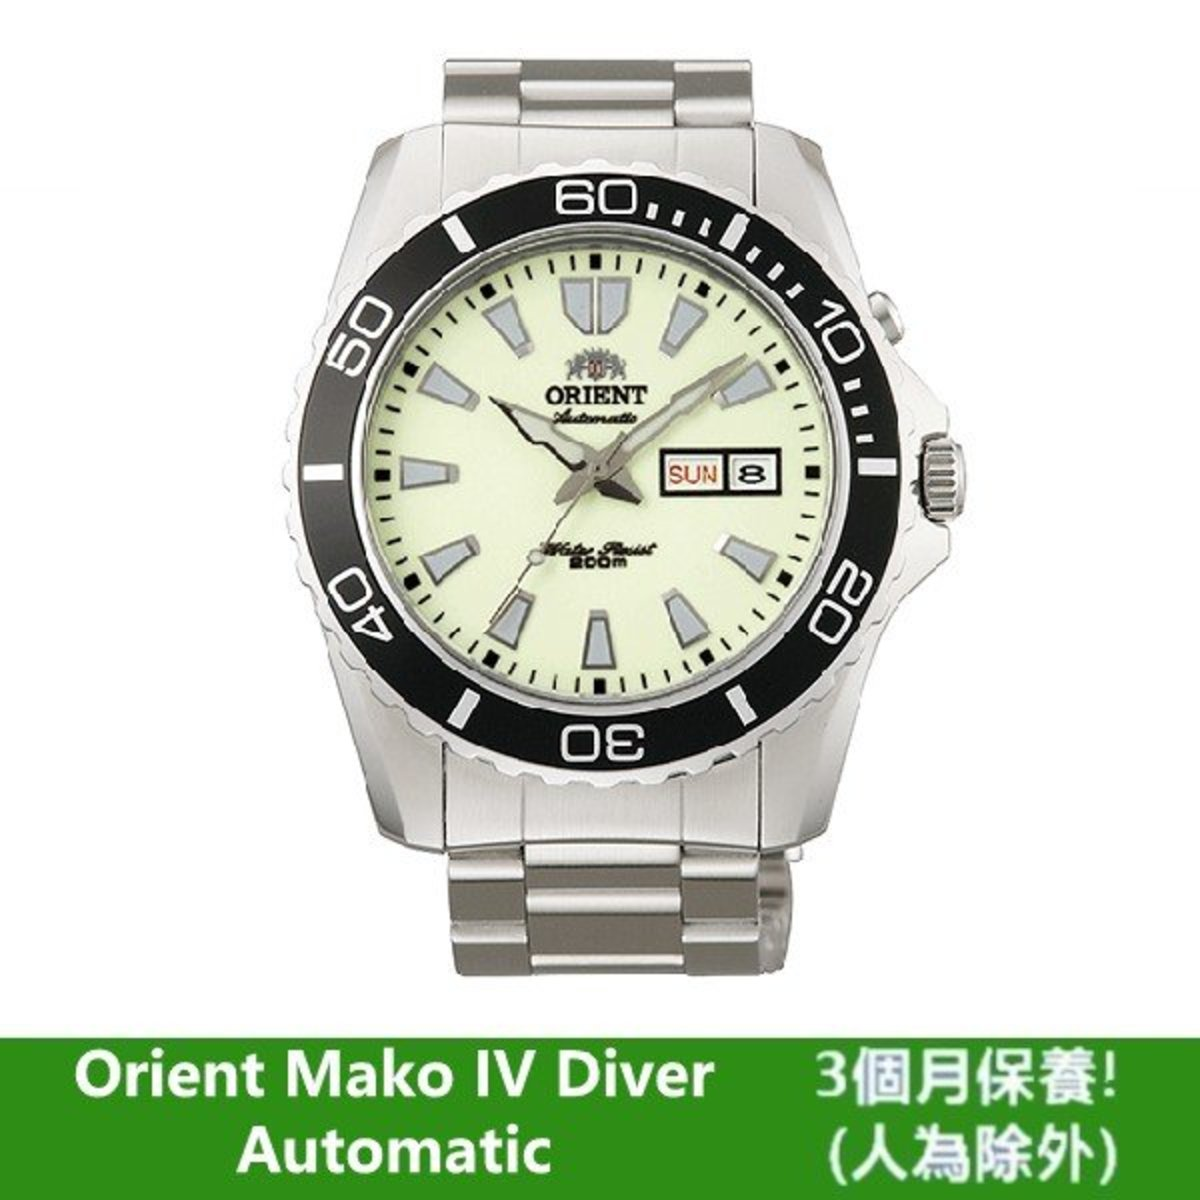 ORIENT MAKO Diver AUTOMATIC Watch FEM75005R9 Parallel import